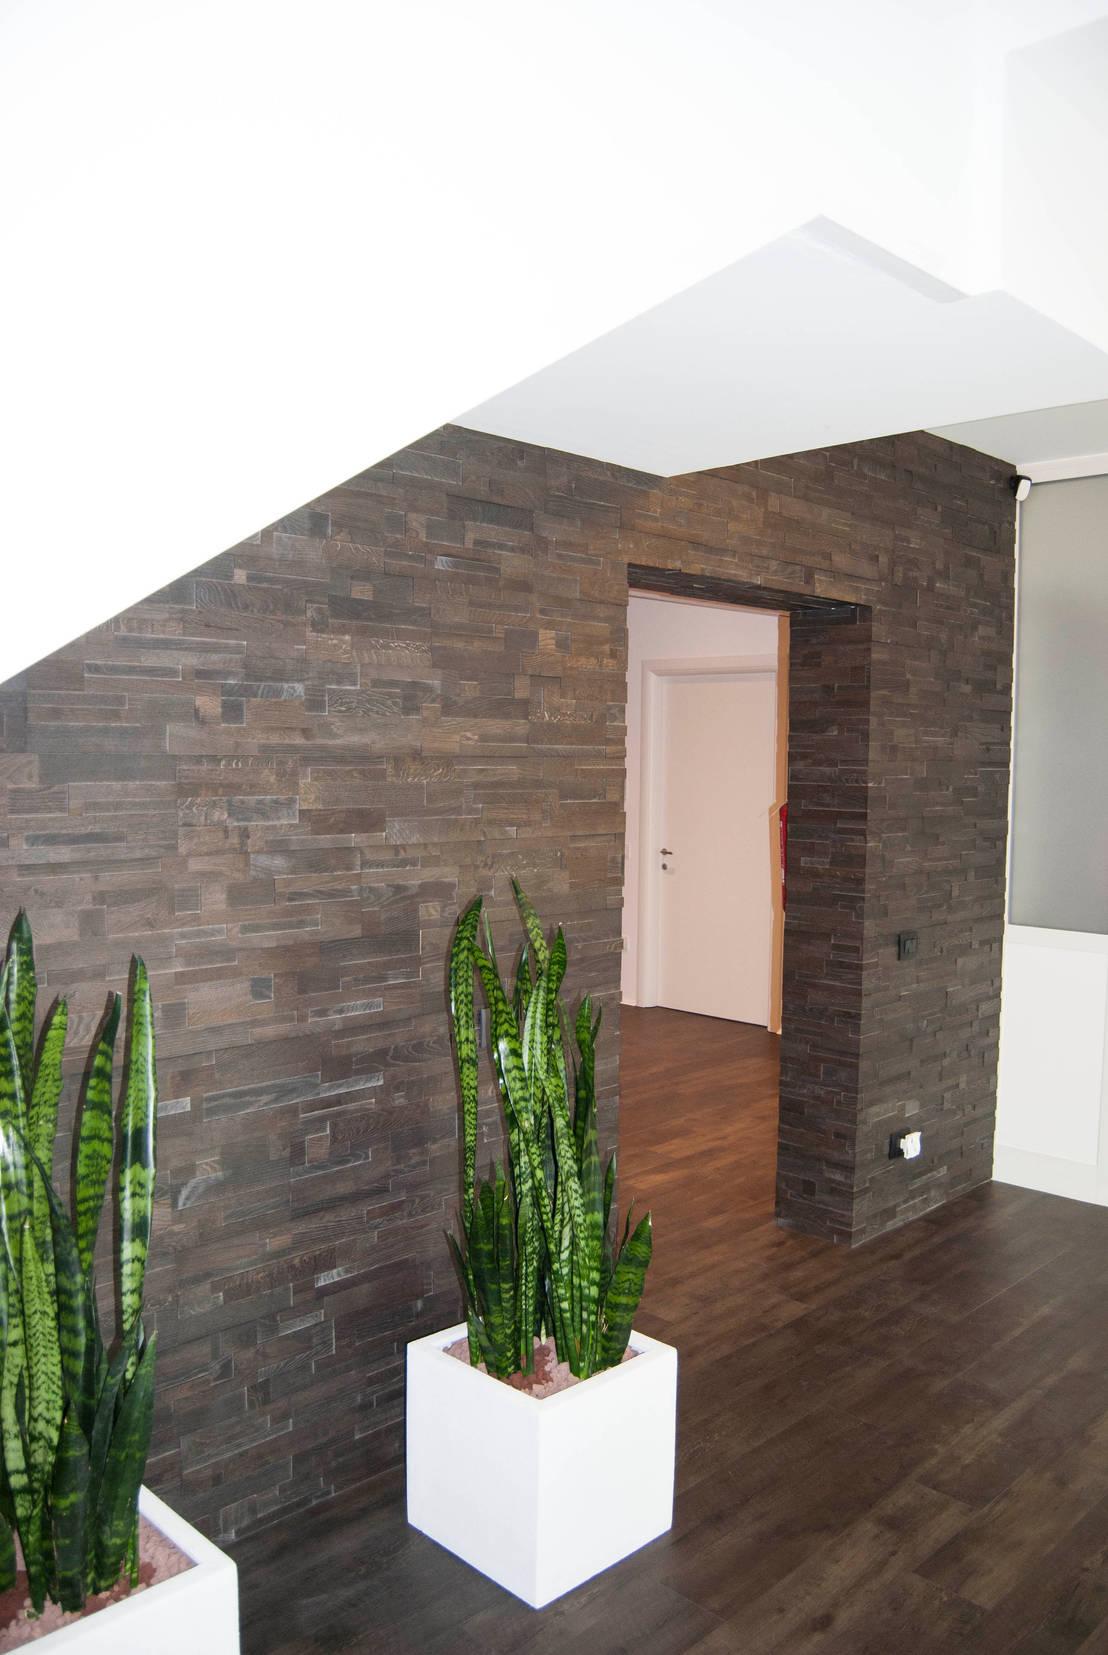 Revestir tus paredes con madera 8 ideas fabulosas - Revestir pared con madera ...